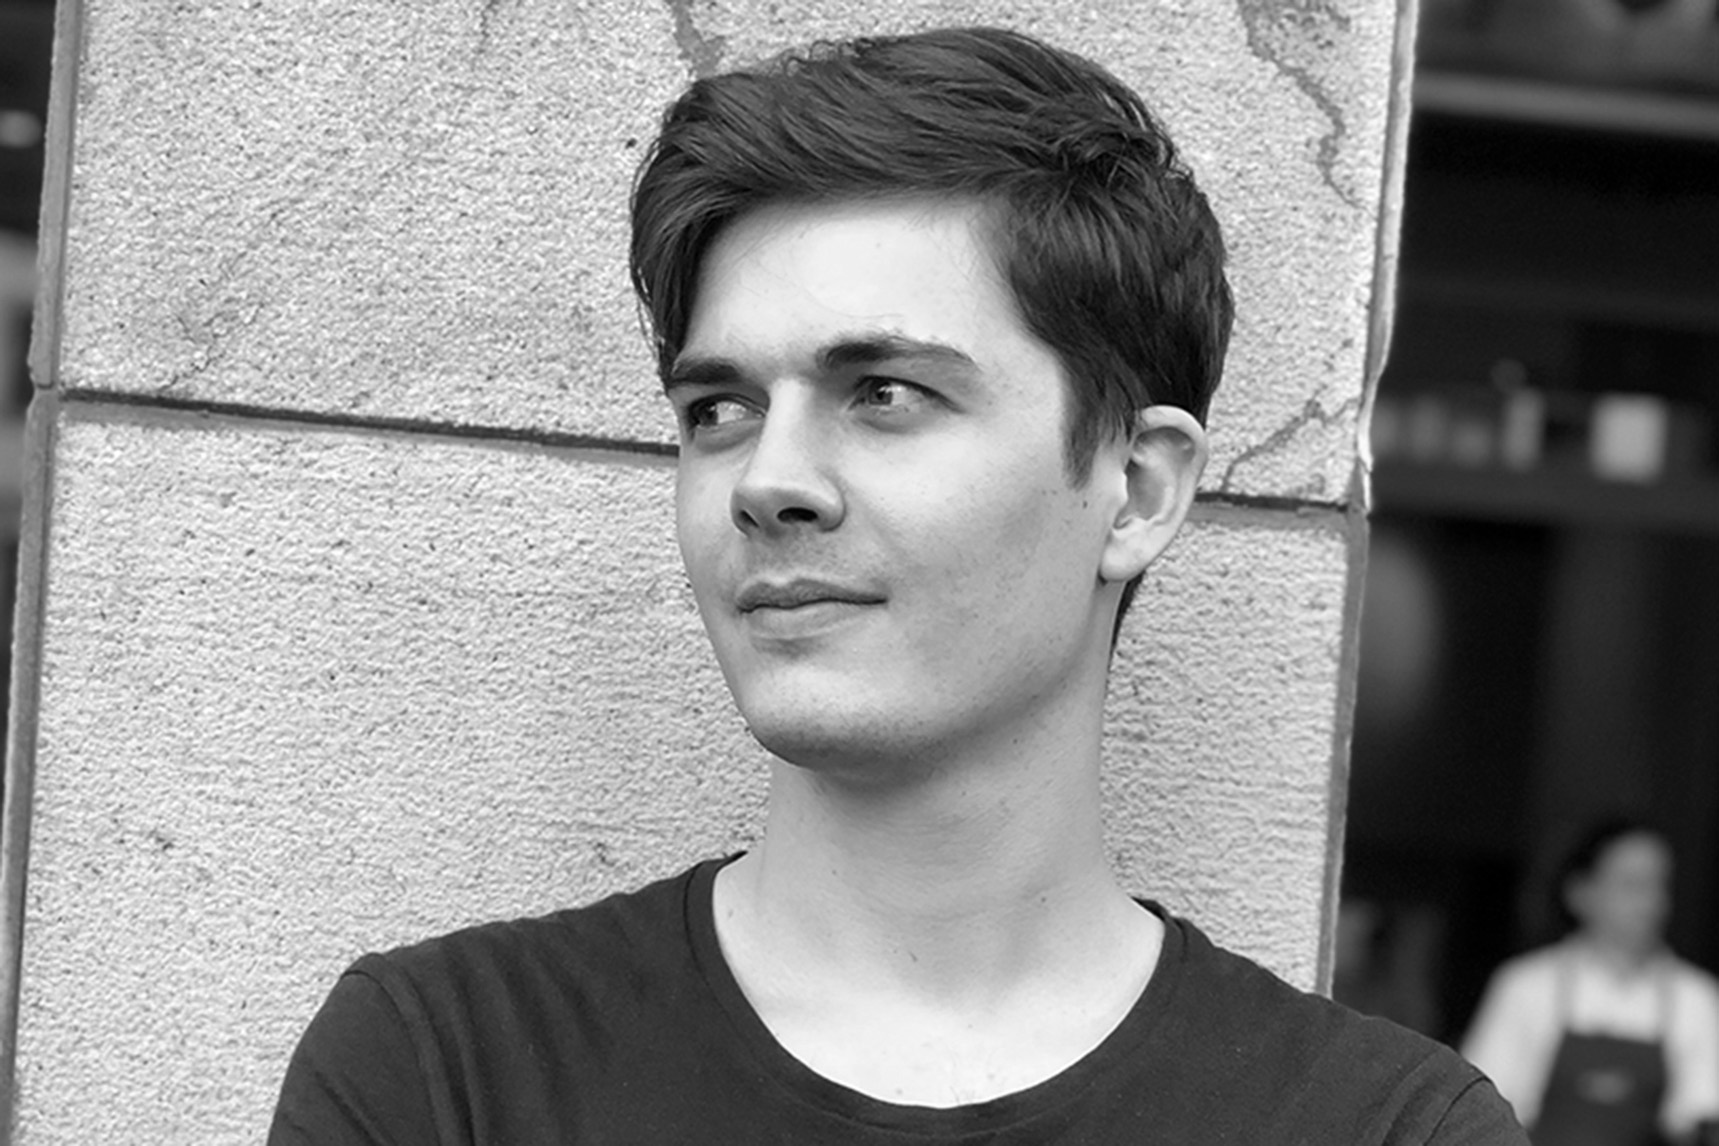 Alessandro Marco Errico